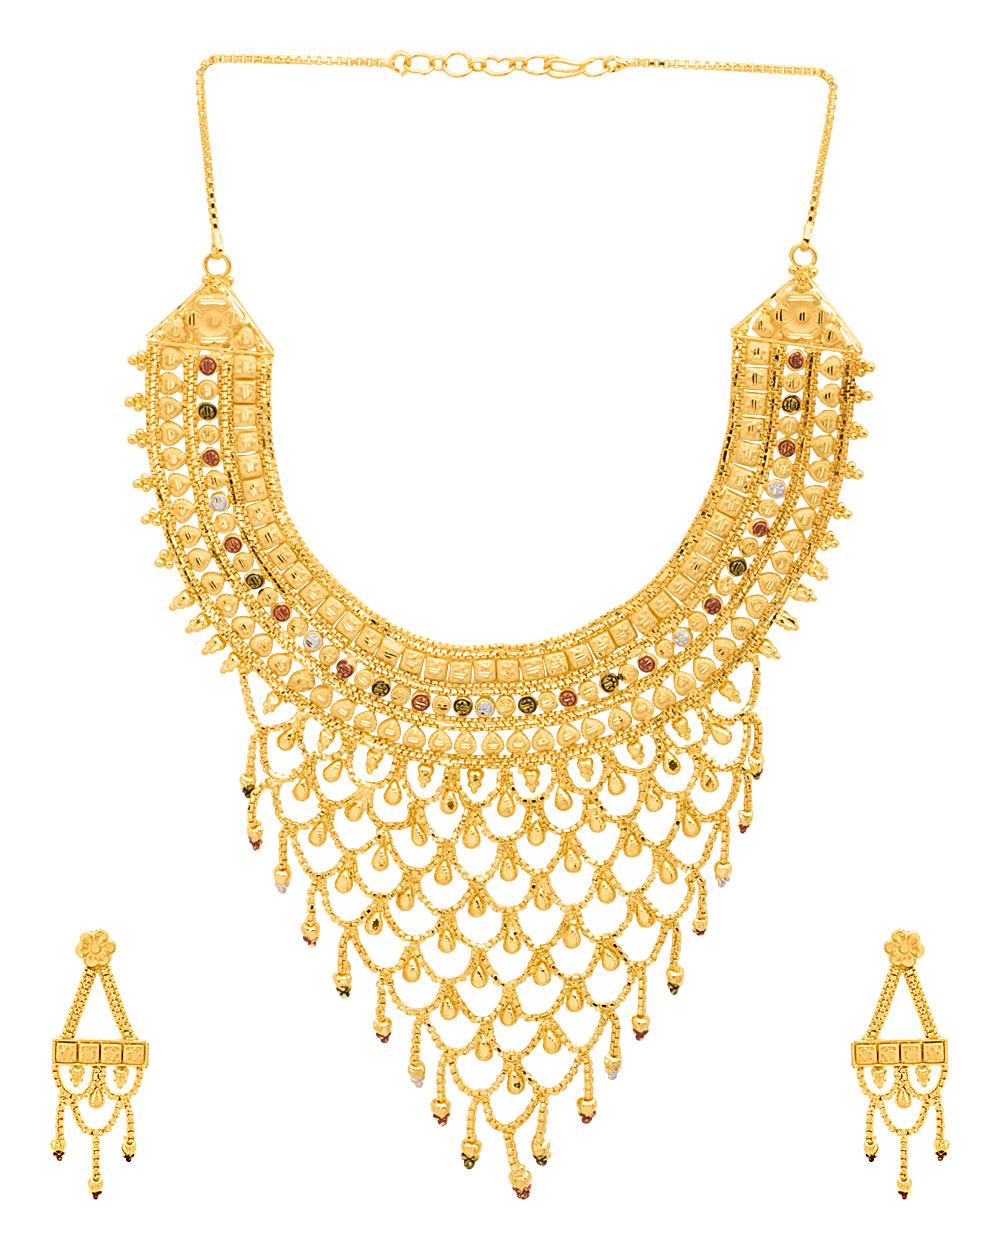 Buy Filigree Design Gold Plated Choker Necklace Set Online India ...